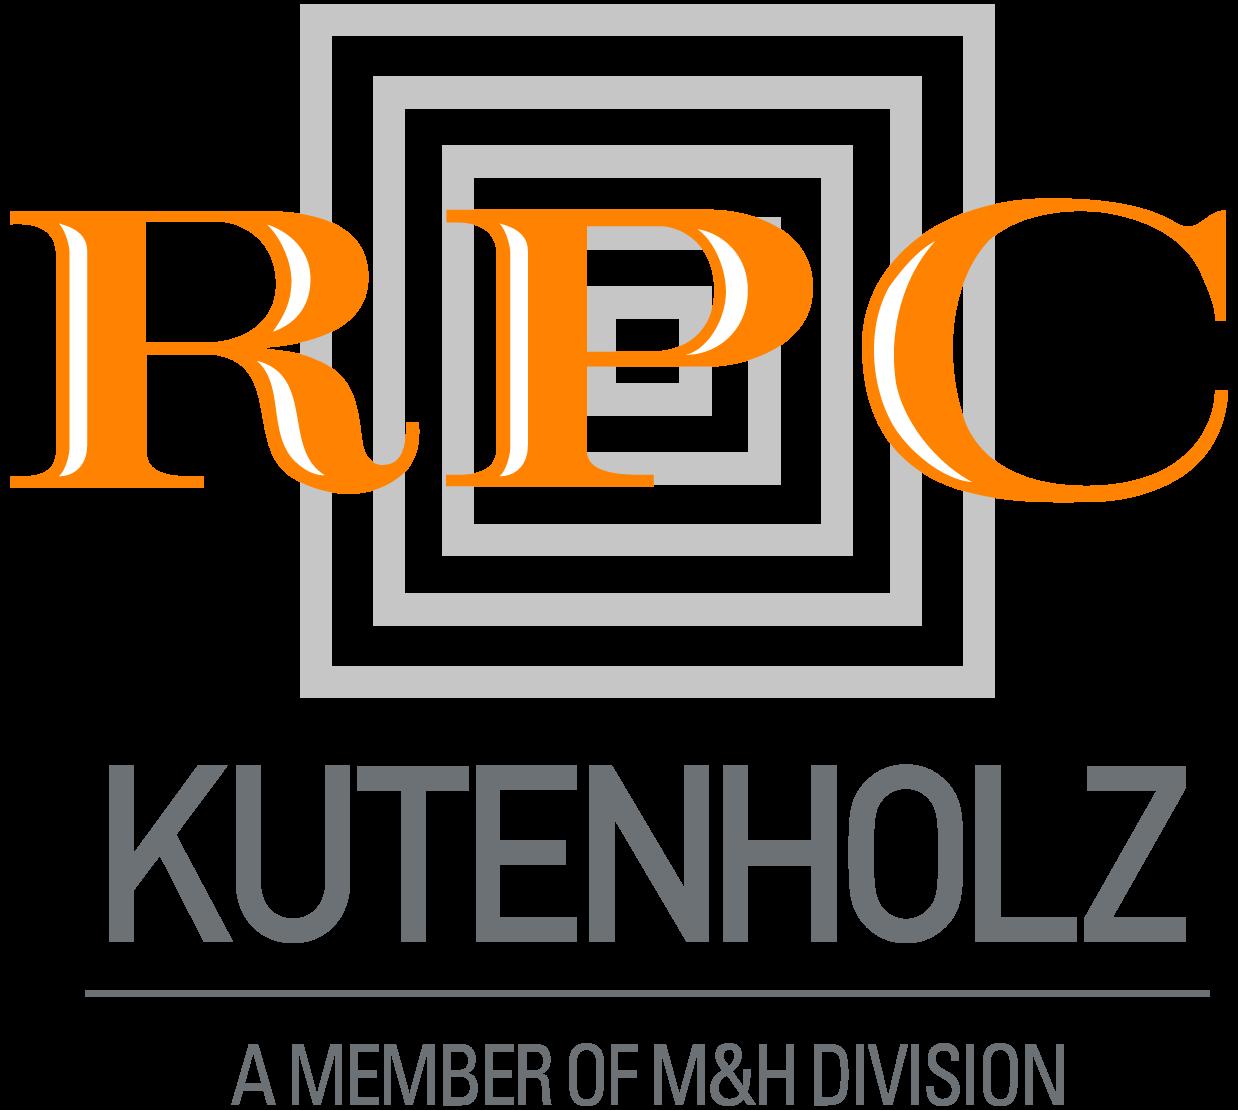 Rpc Kutenholz Logo